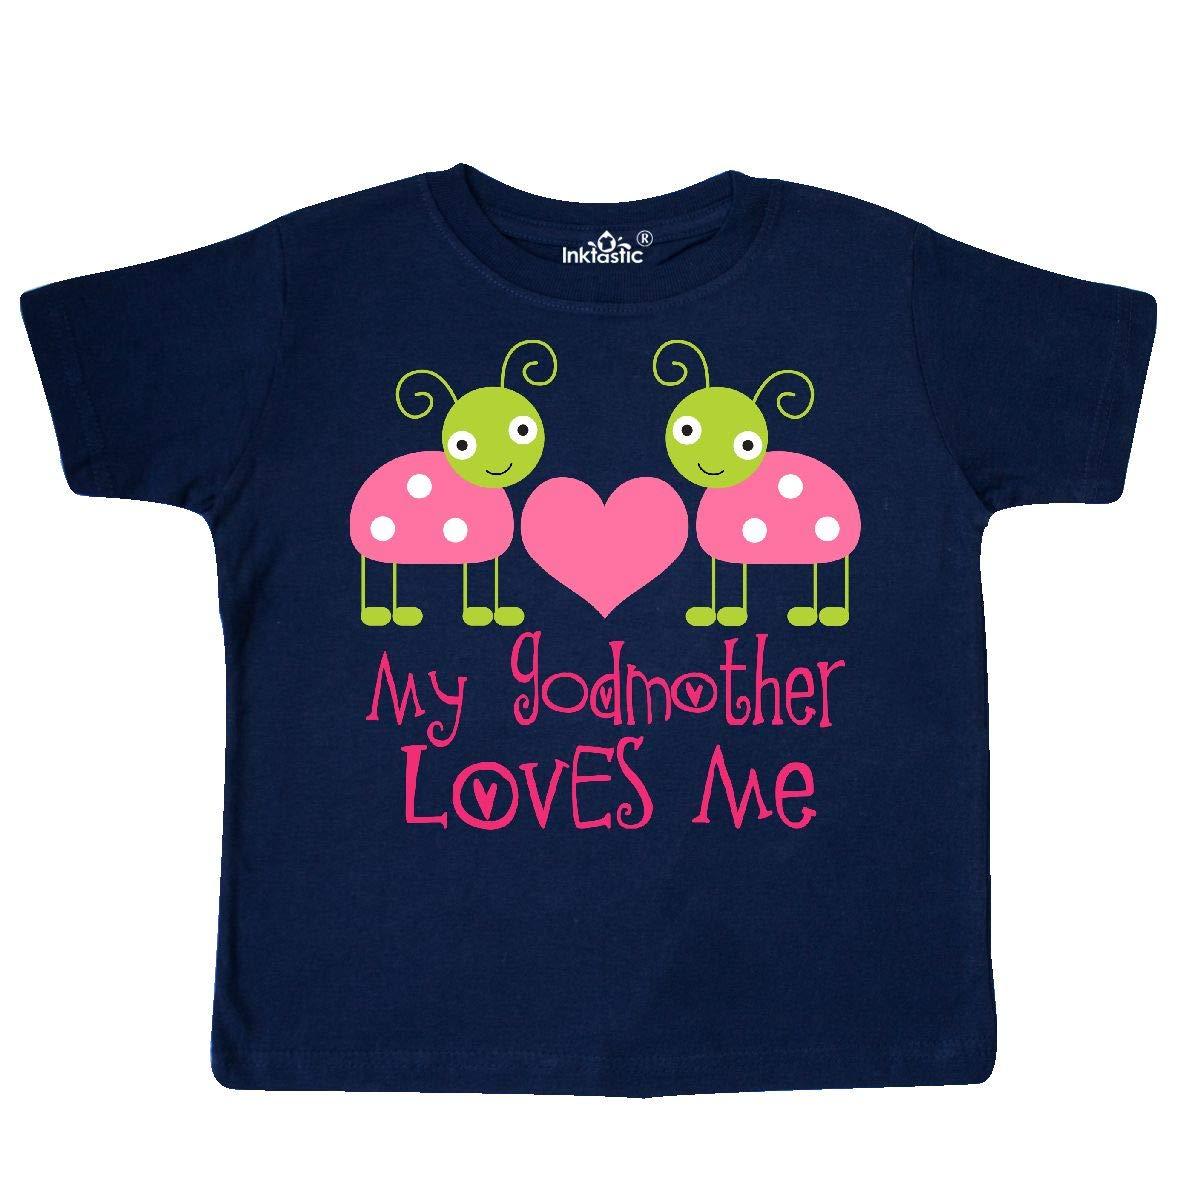 inktastic My Godmother Loves Me Girls Ladybug Toddler T-Shirt